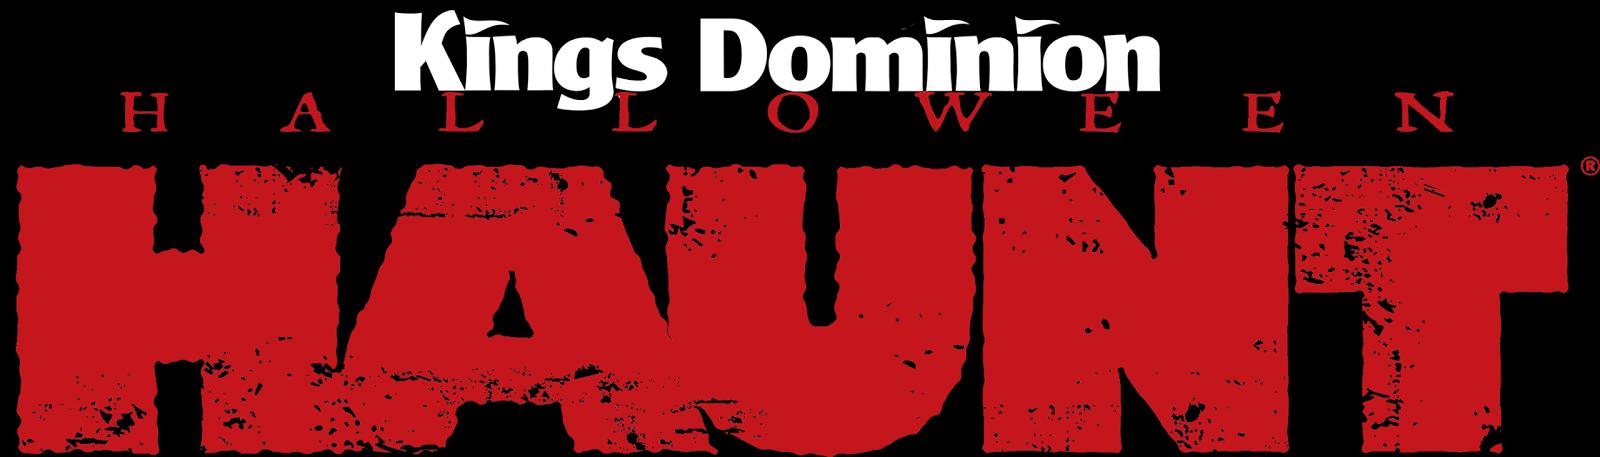 kings dominion fright fest